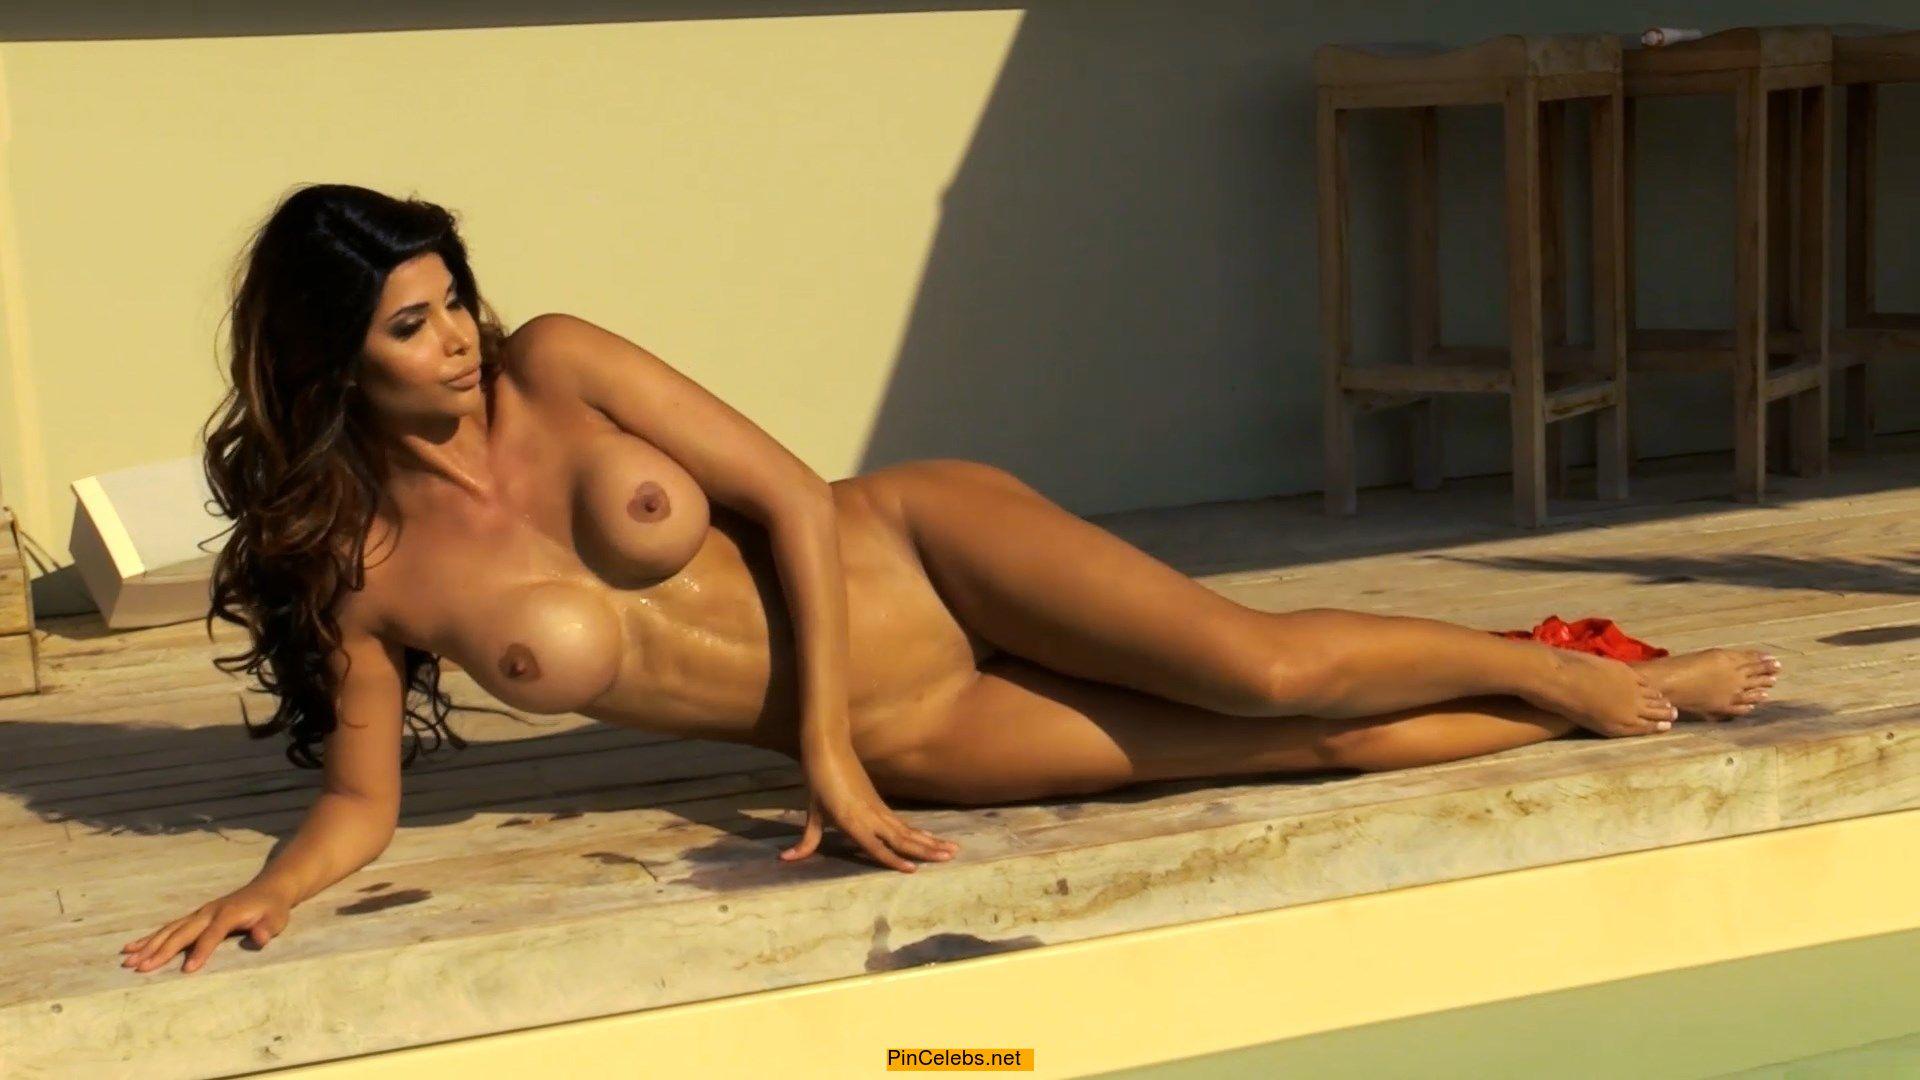 Trudy schaefer nude